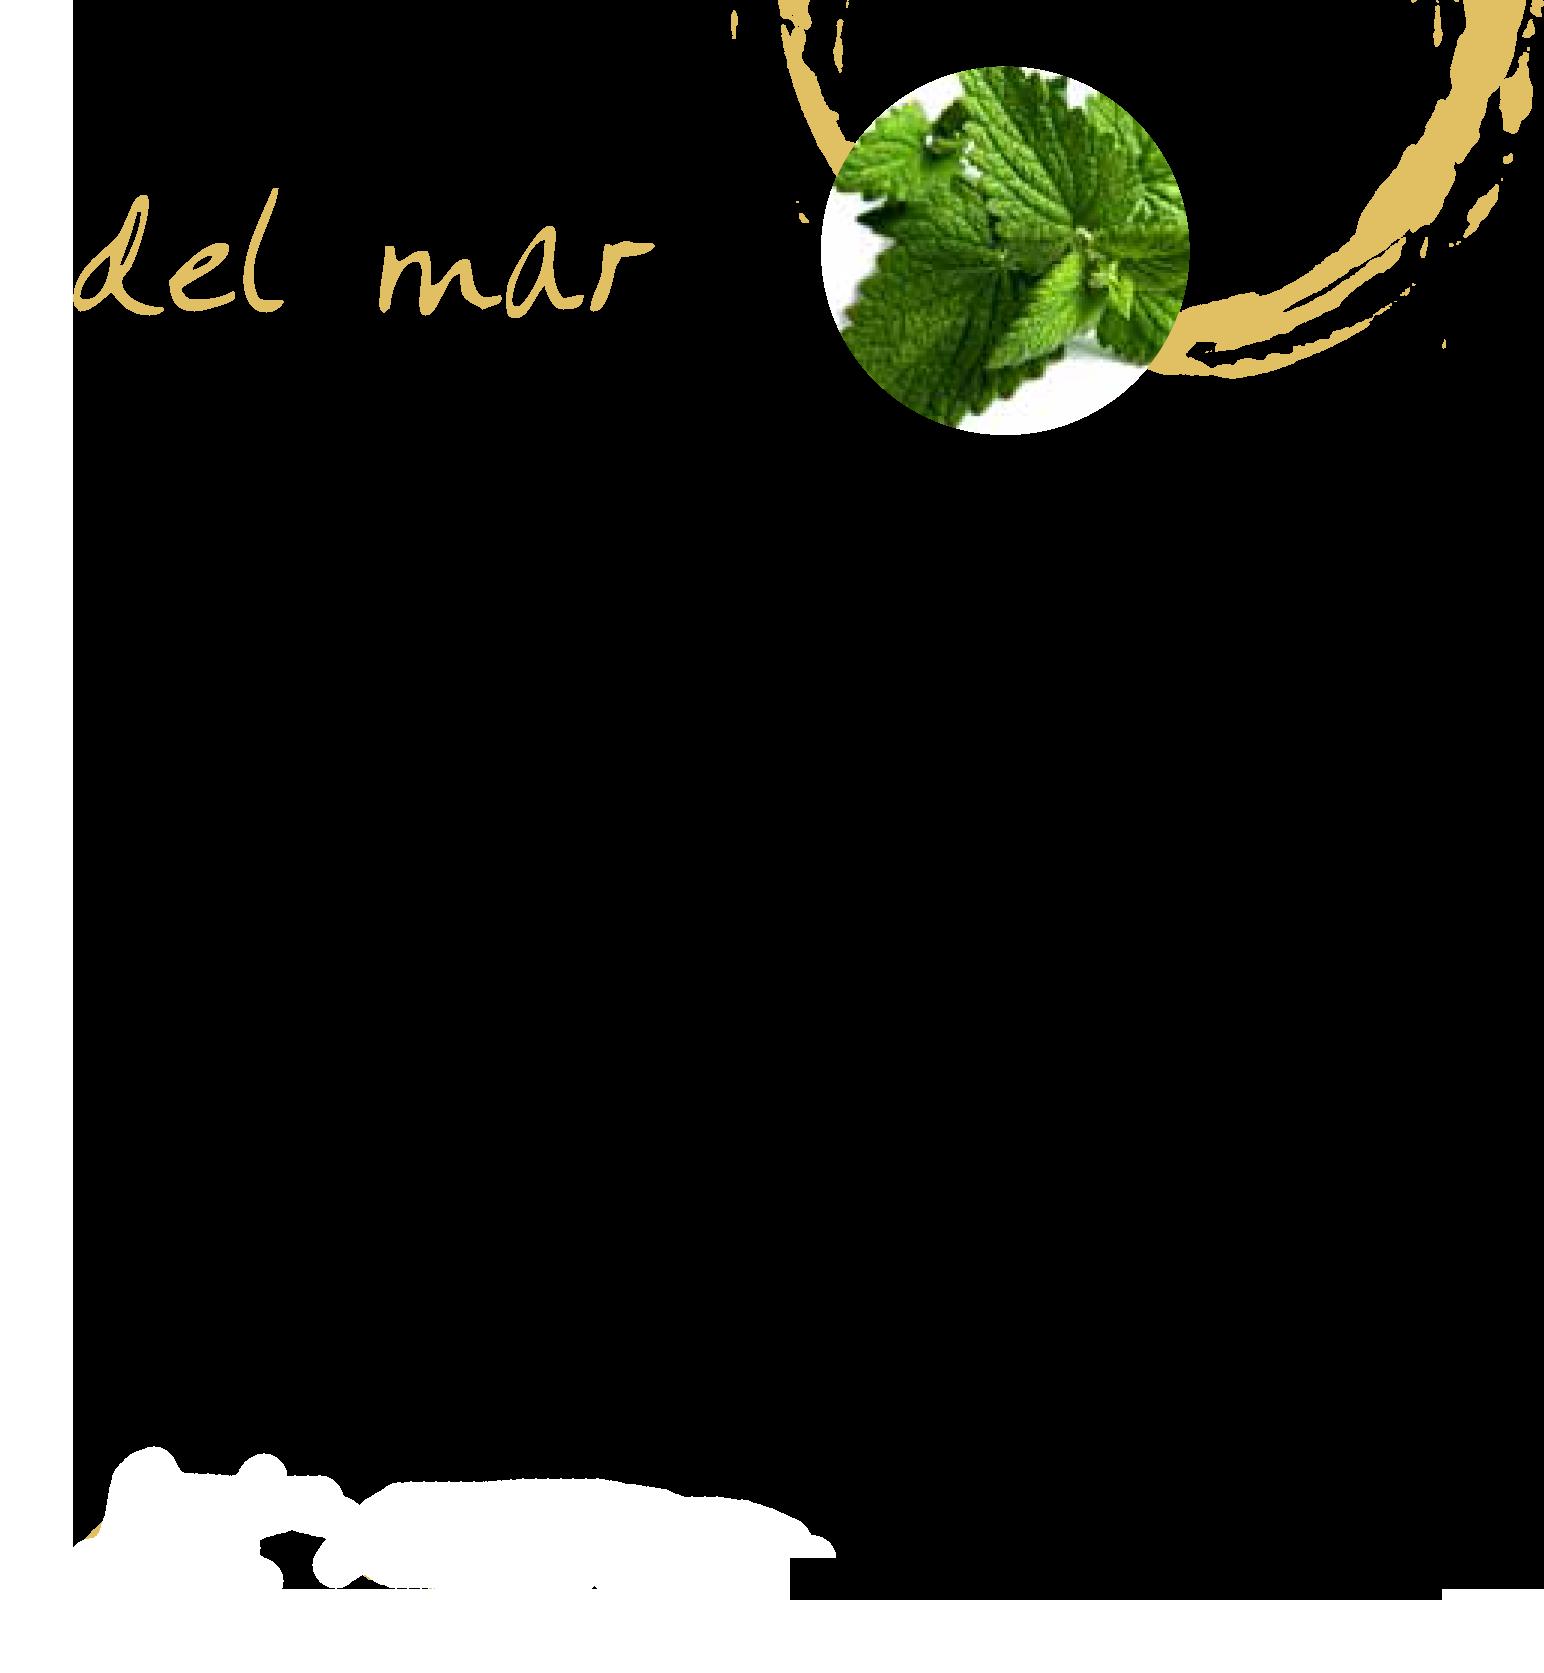 del-amr